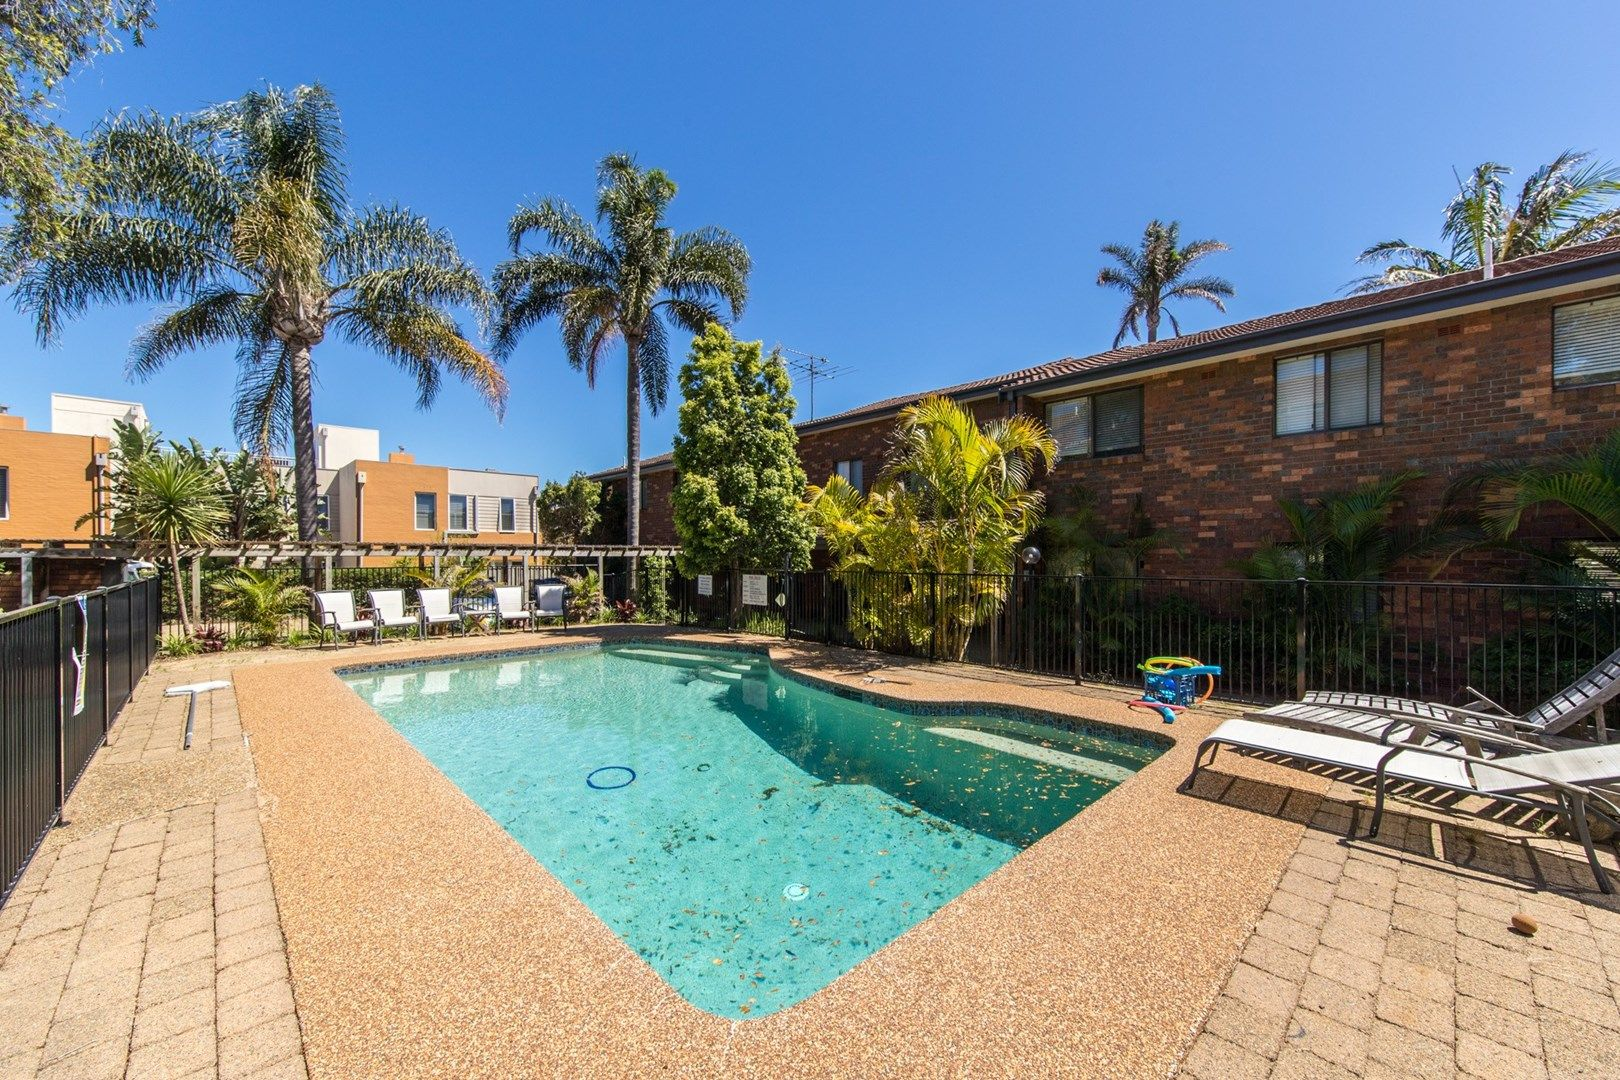 L 6/35 Darley Street East, Mona Vale NSW 2103, Image 1